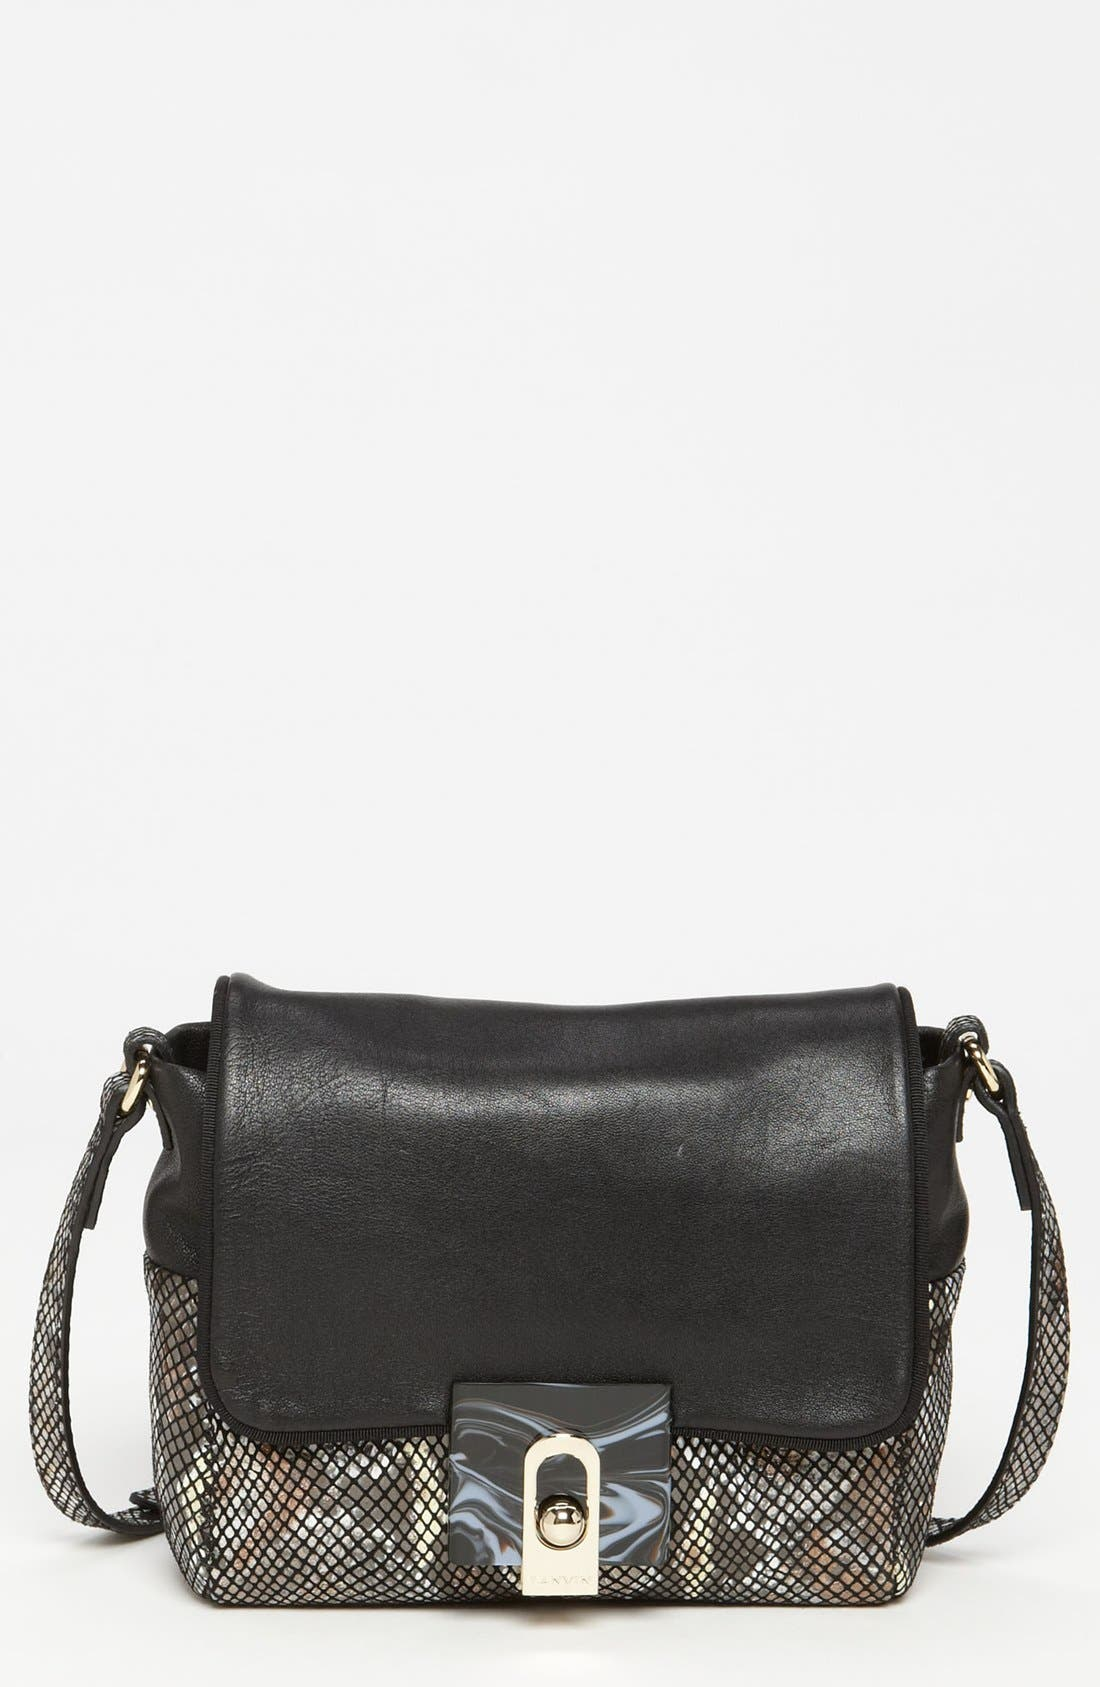 Main Image - Lanvin 'For Me - Small' Faux Snakeskin Crossbody Bag